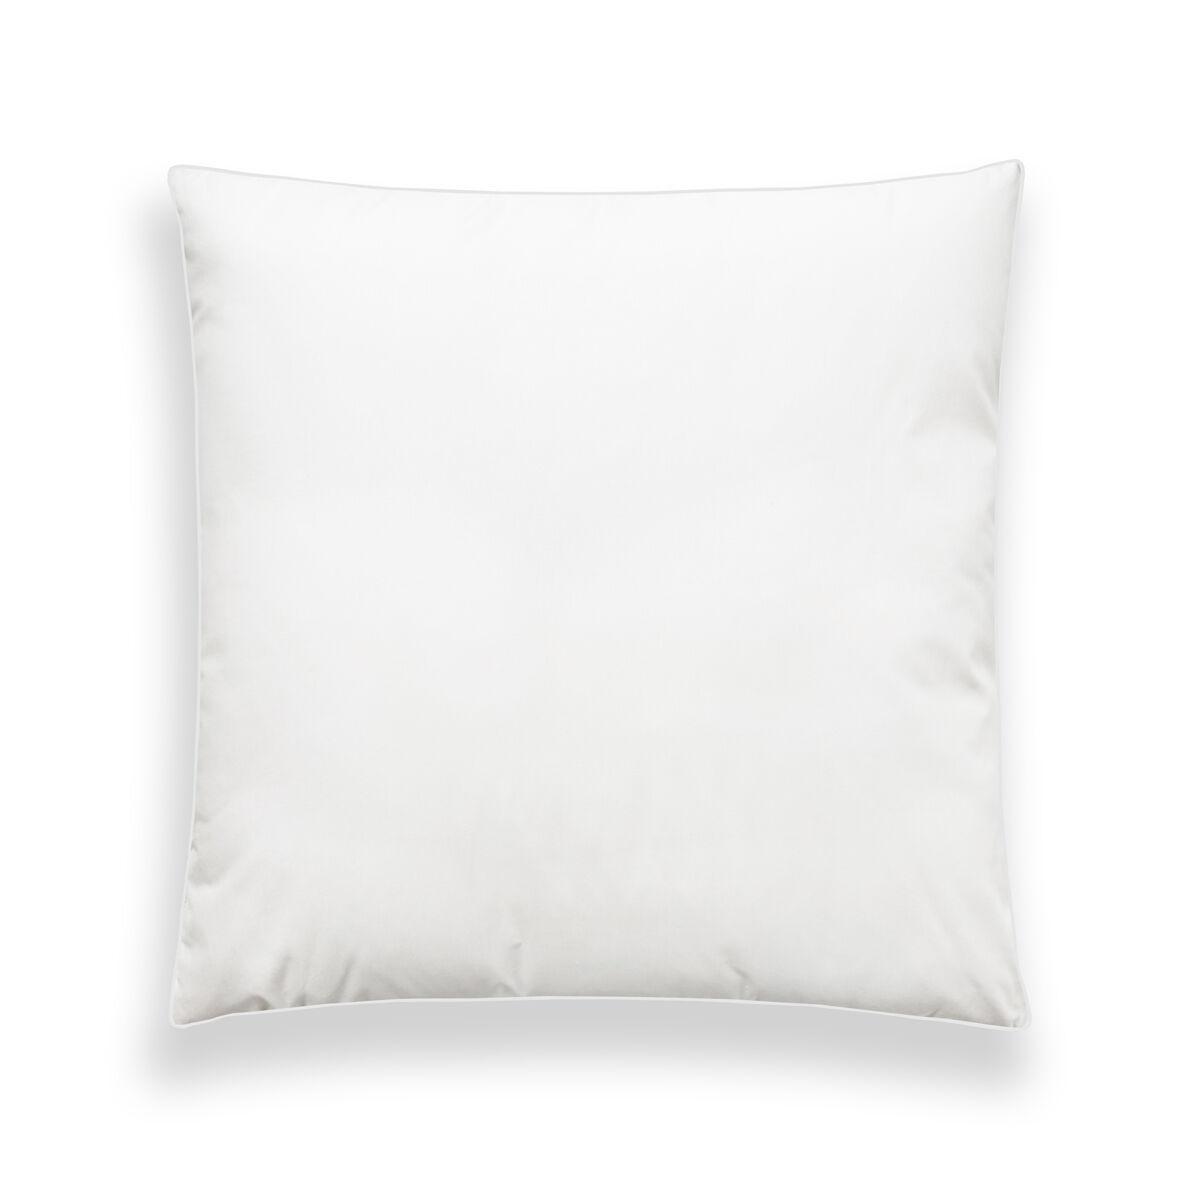 WAKE ME GREEN Oreiller MEDIUM 30% Duvet Anti-acariens - Coton Bio  50x75 cm